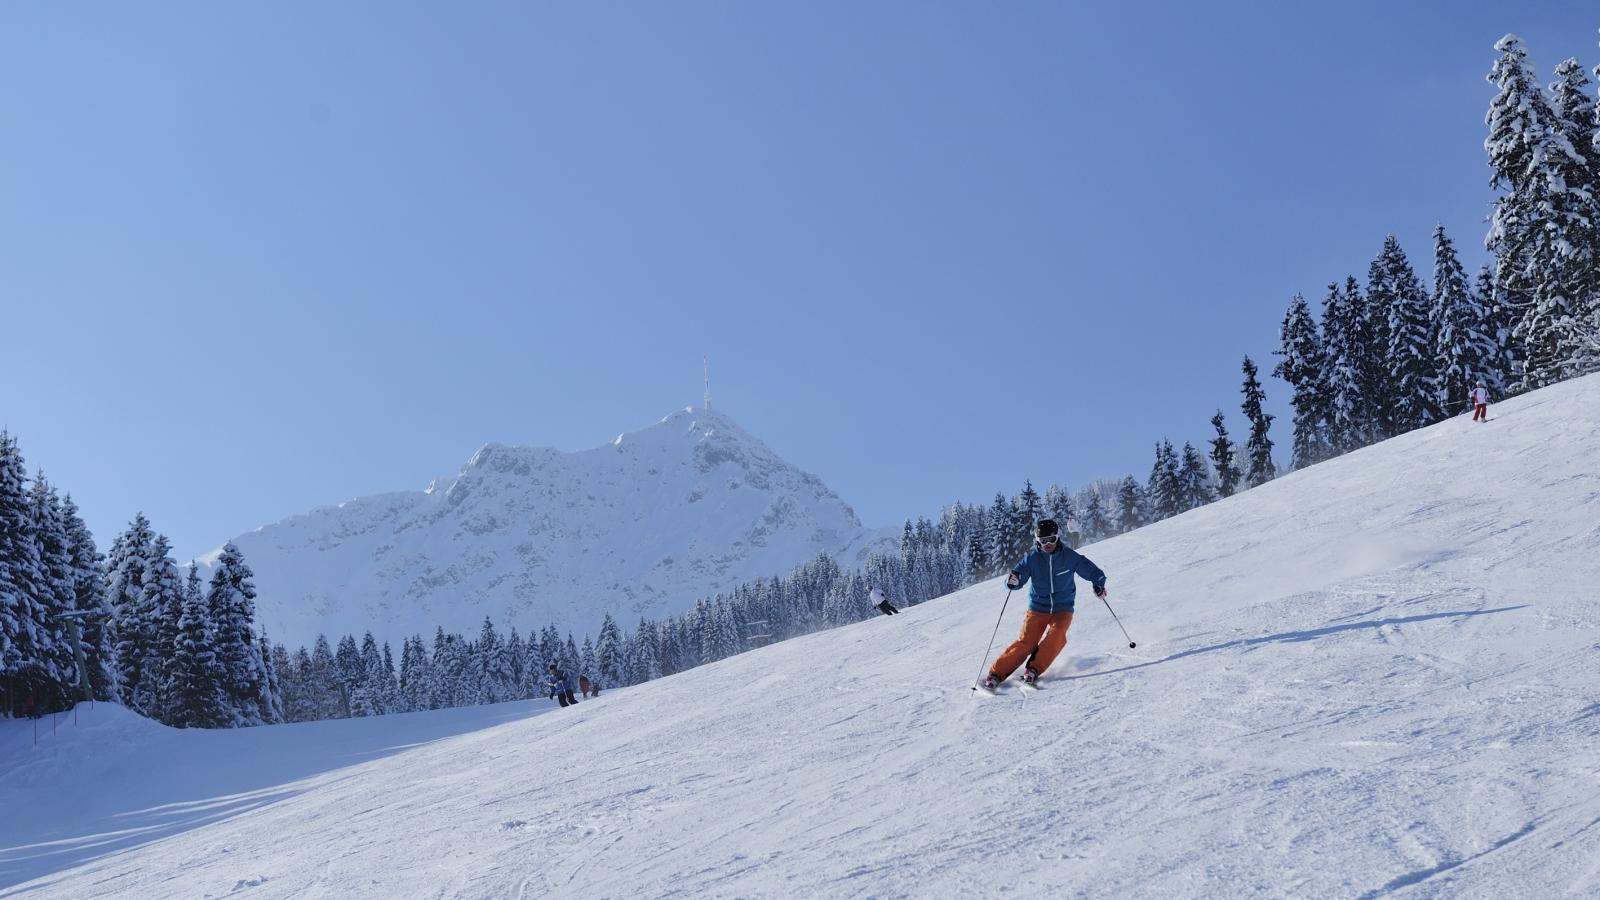 Ski Holidays To St Johann In Tirol Topflight Ireland S